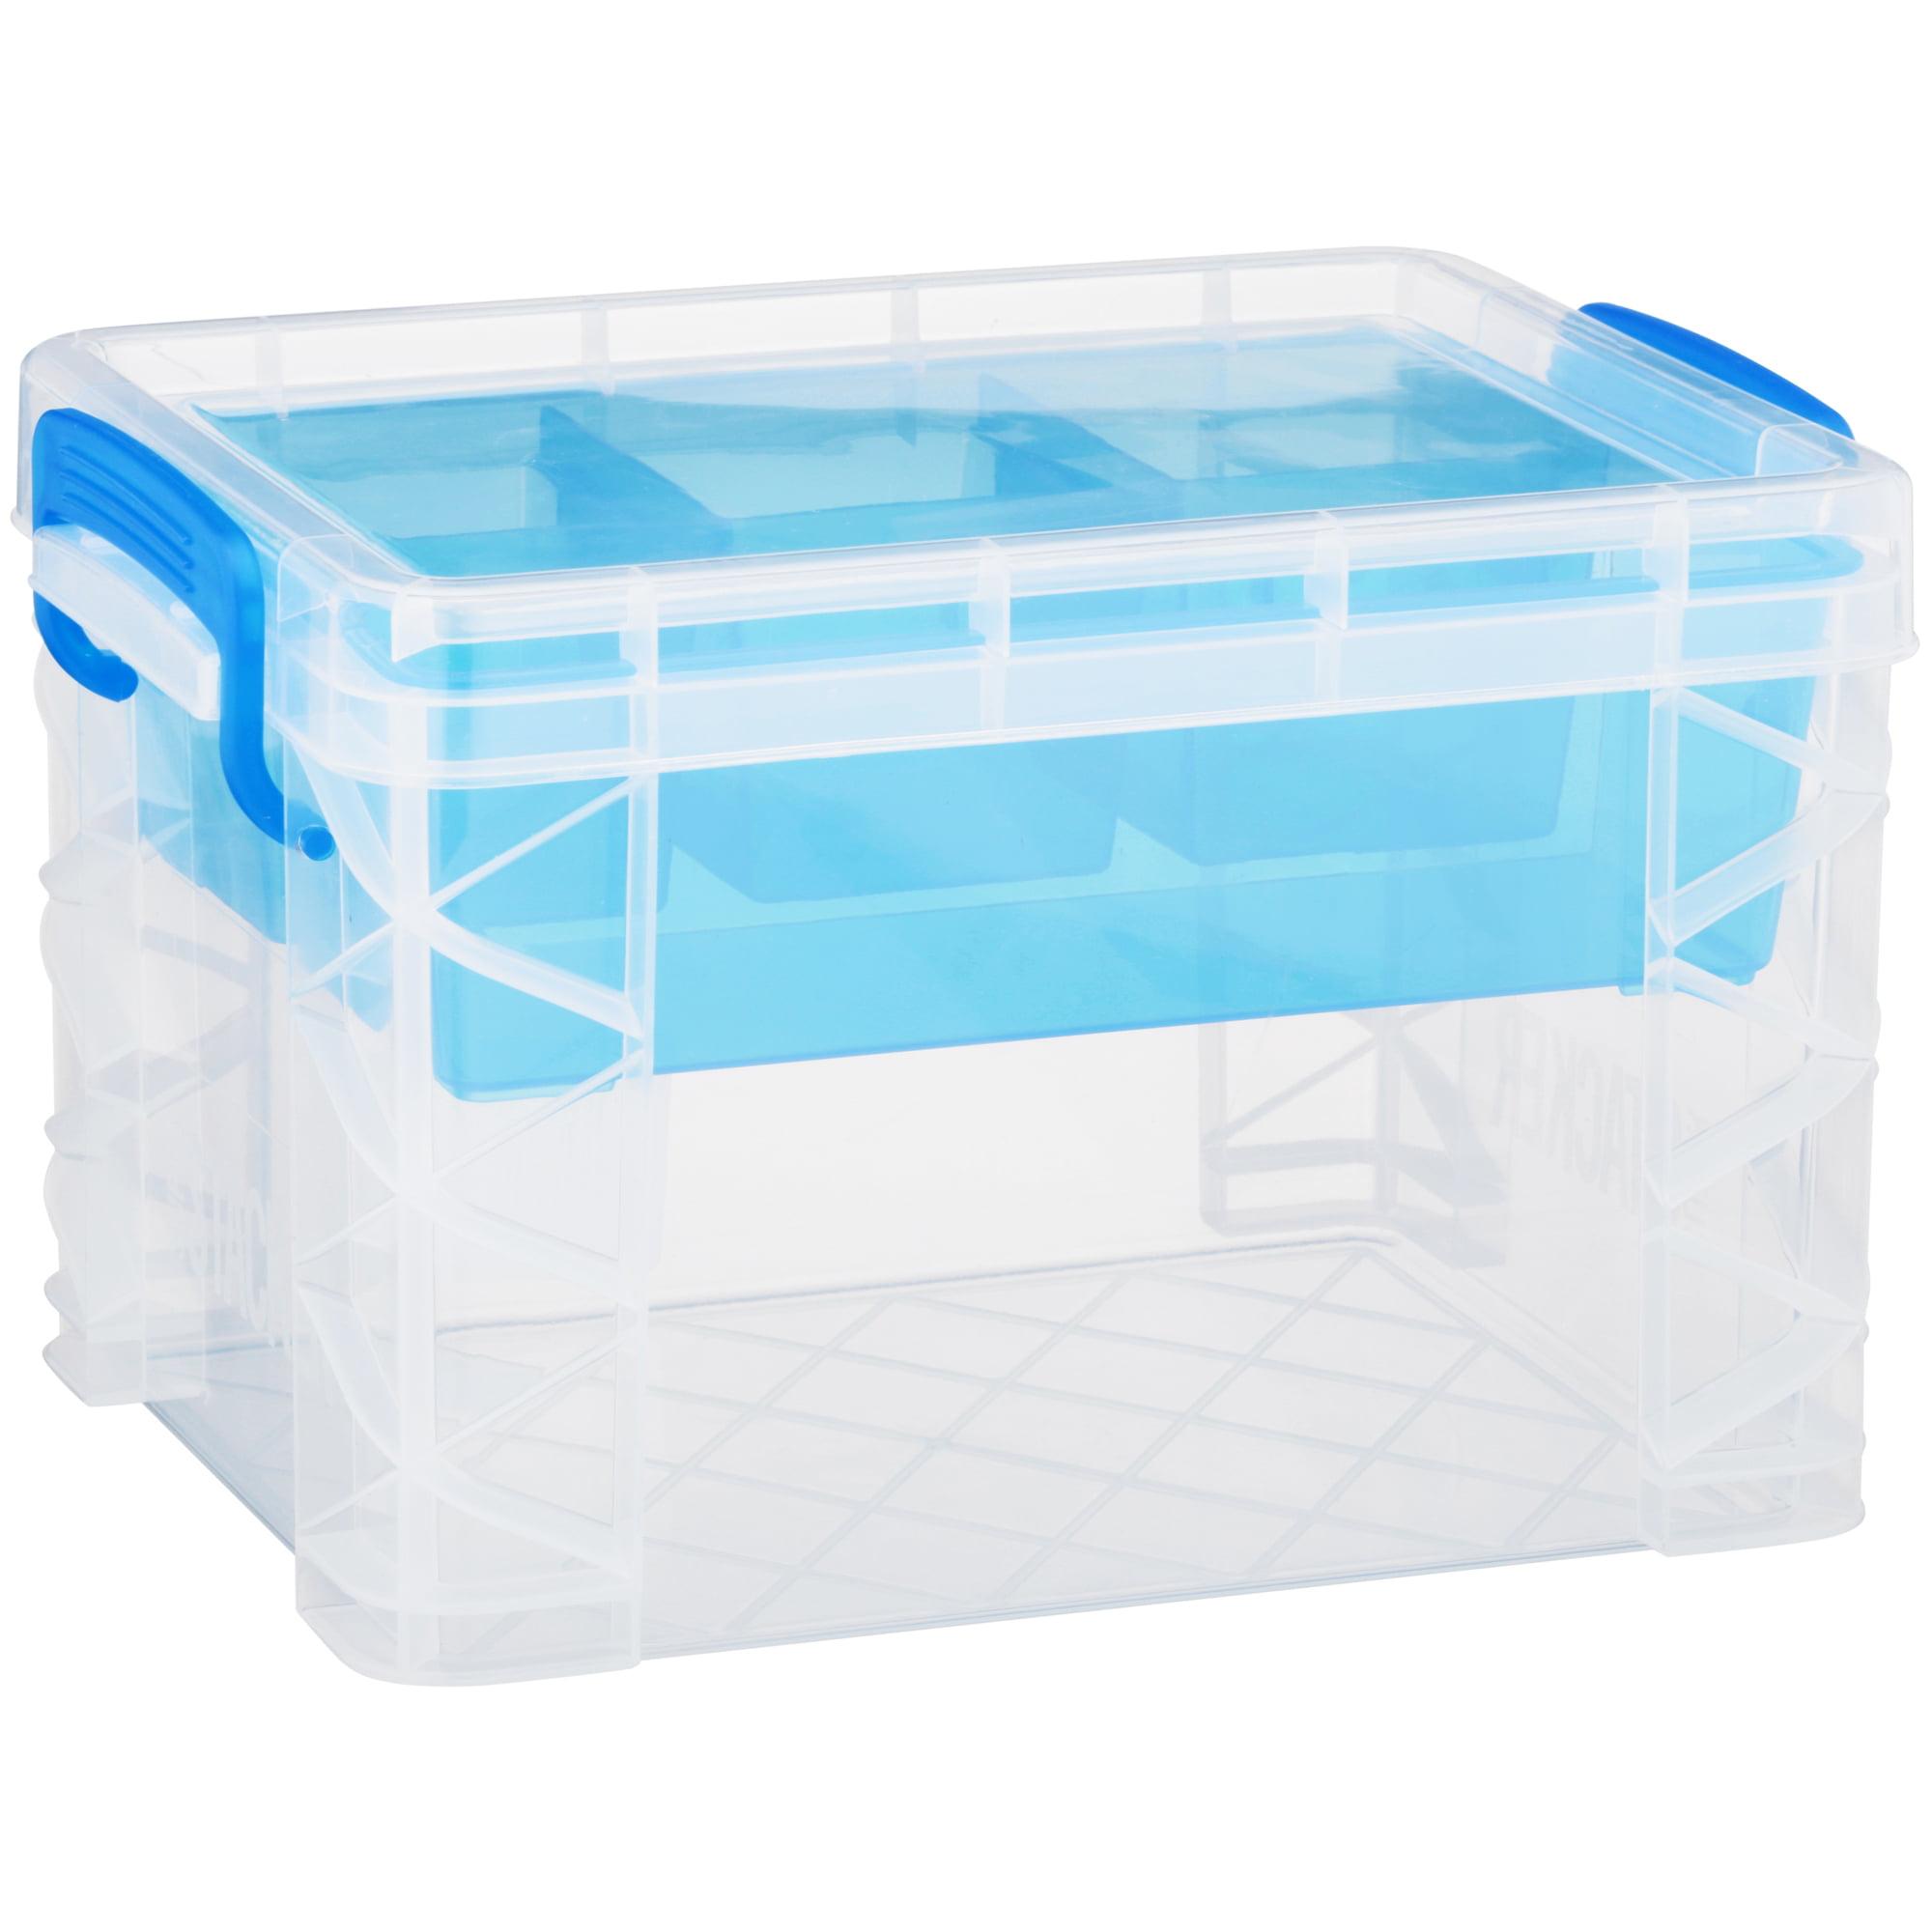 Advantus Super Stacker Divided Storage Box Clear w//Blue Tray//Handles 10.3 x 14